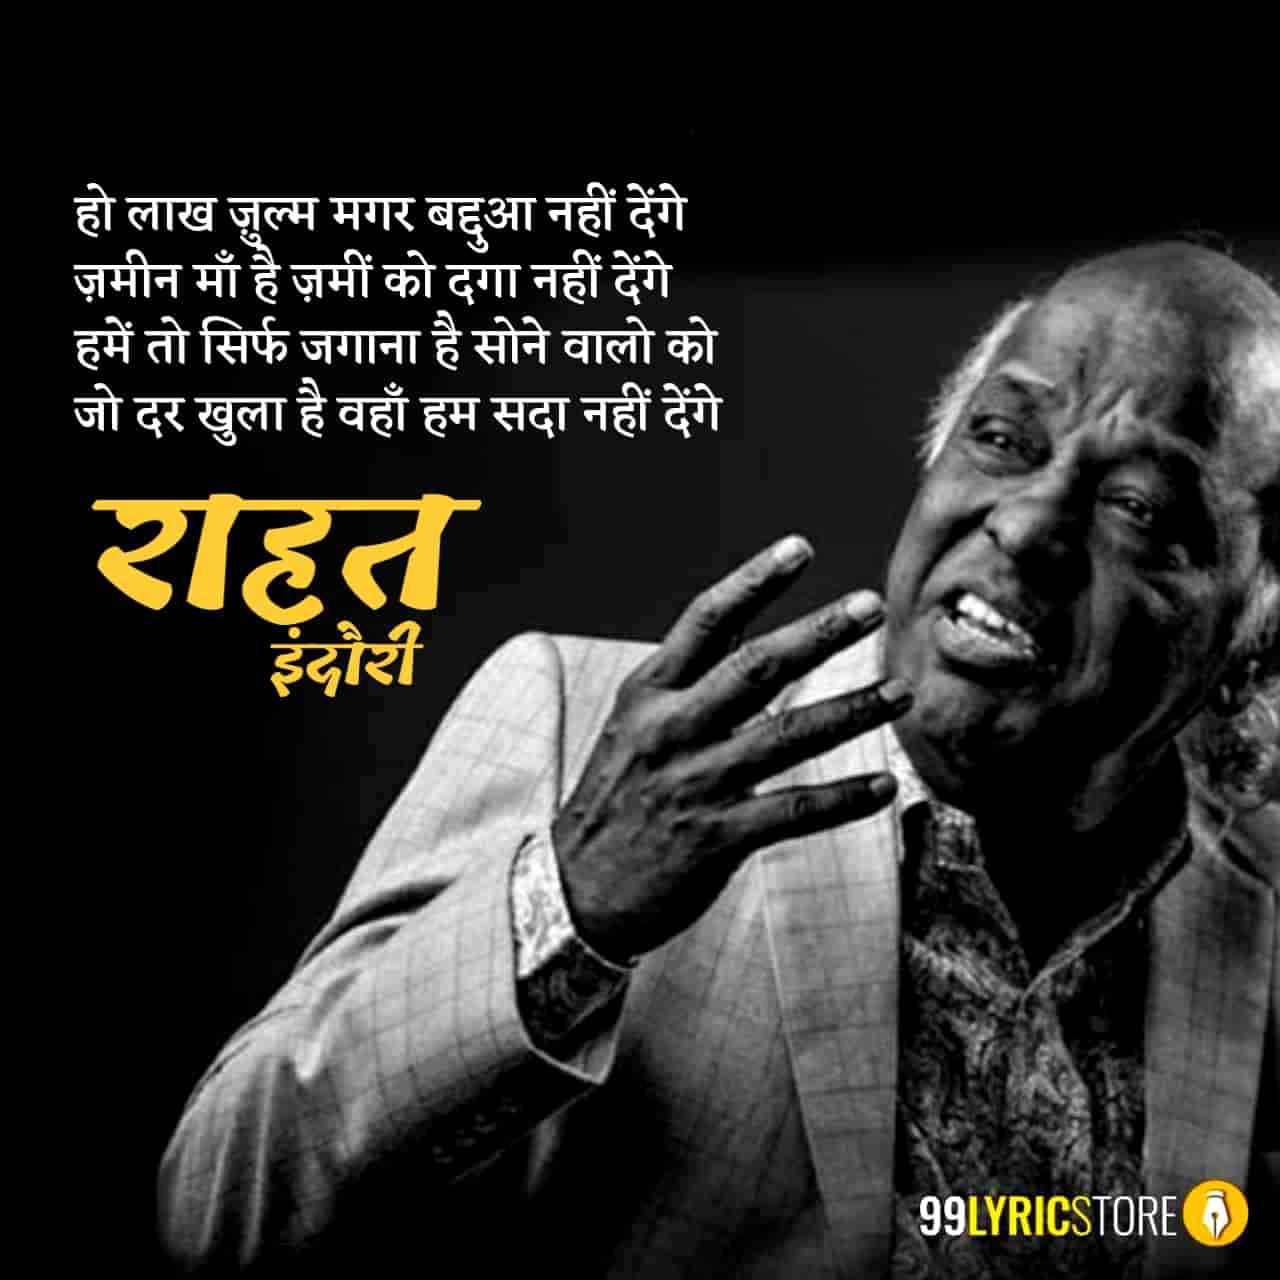 Zameen Maa Hai Zamin Ko Daga Nahi Denge Shayari Images By Rahat Indori